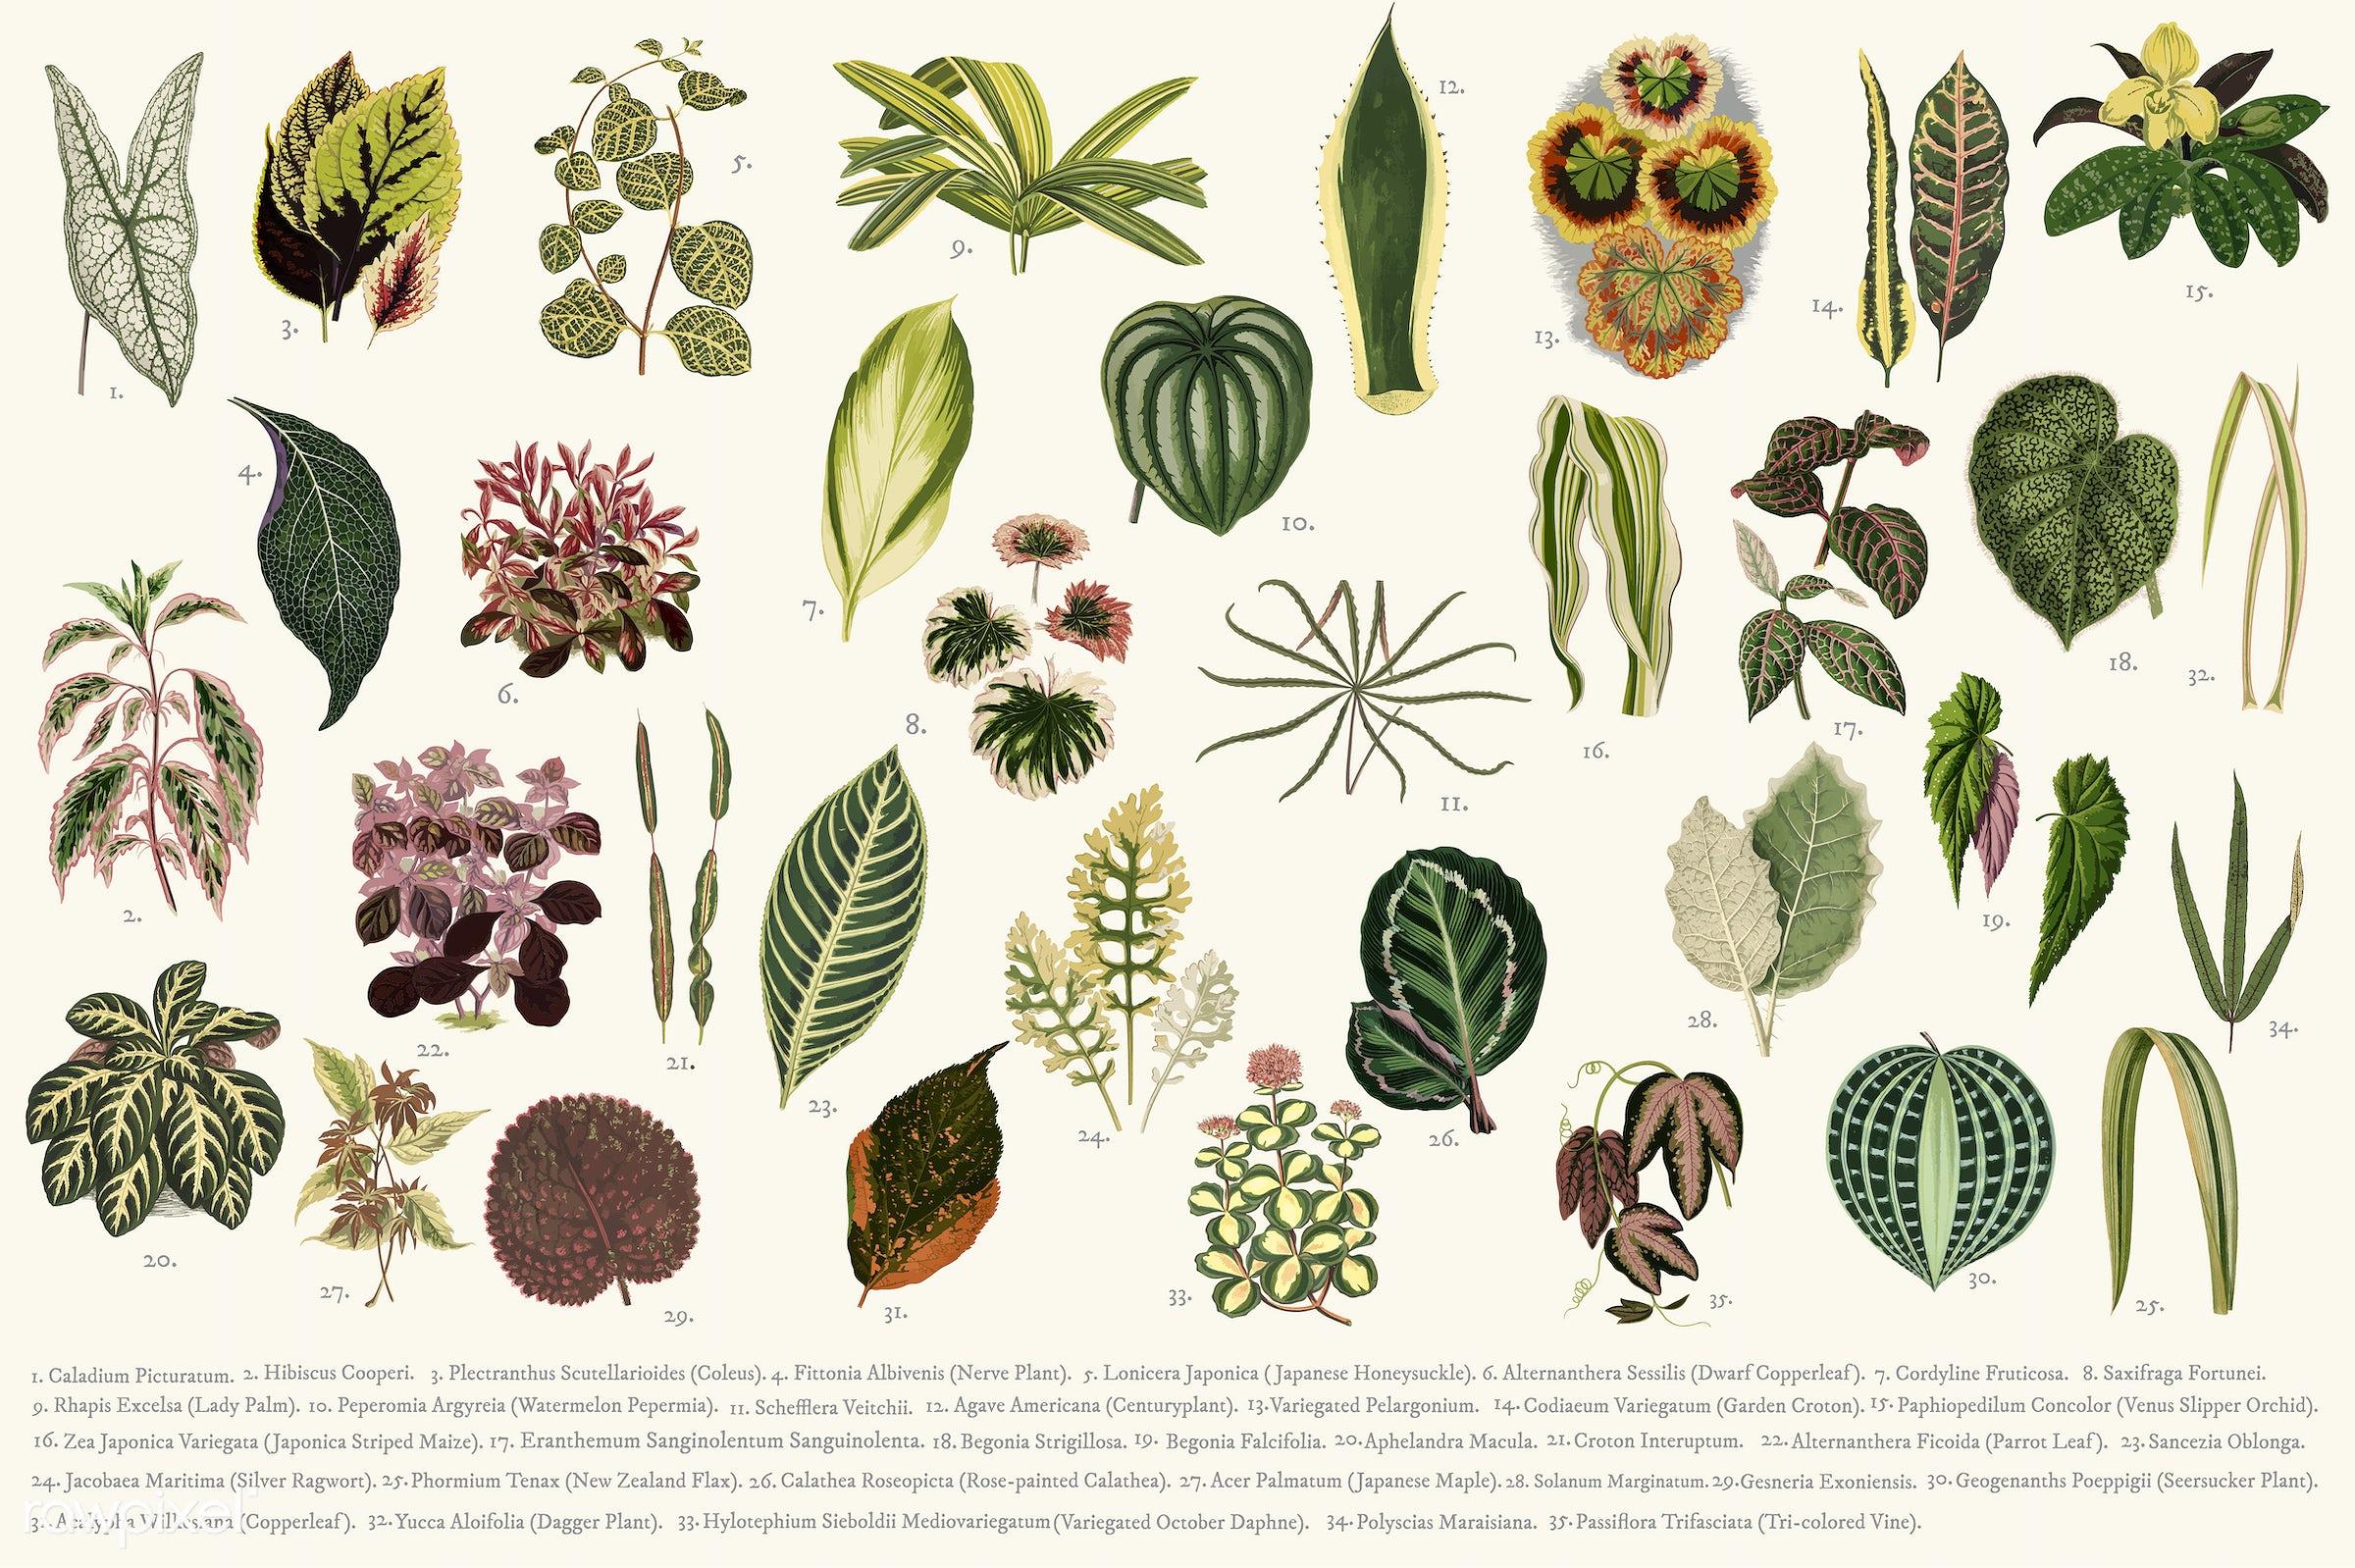 pattern, texture, illustration, vintage, plant, set, tree, begonia, decoration, alternanthera, aphelandra maculata,...